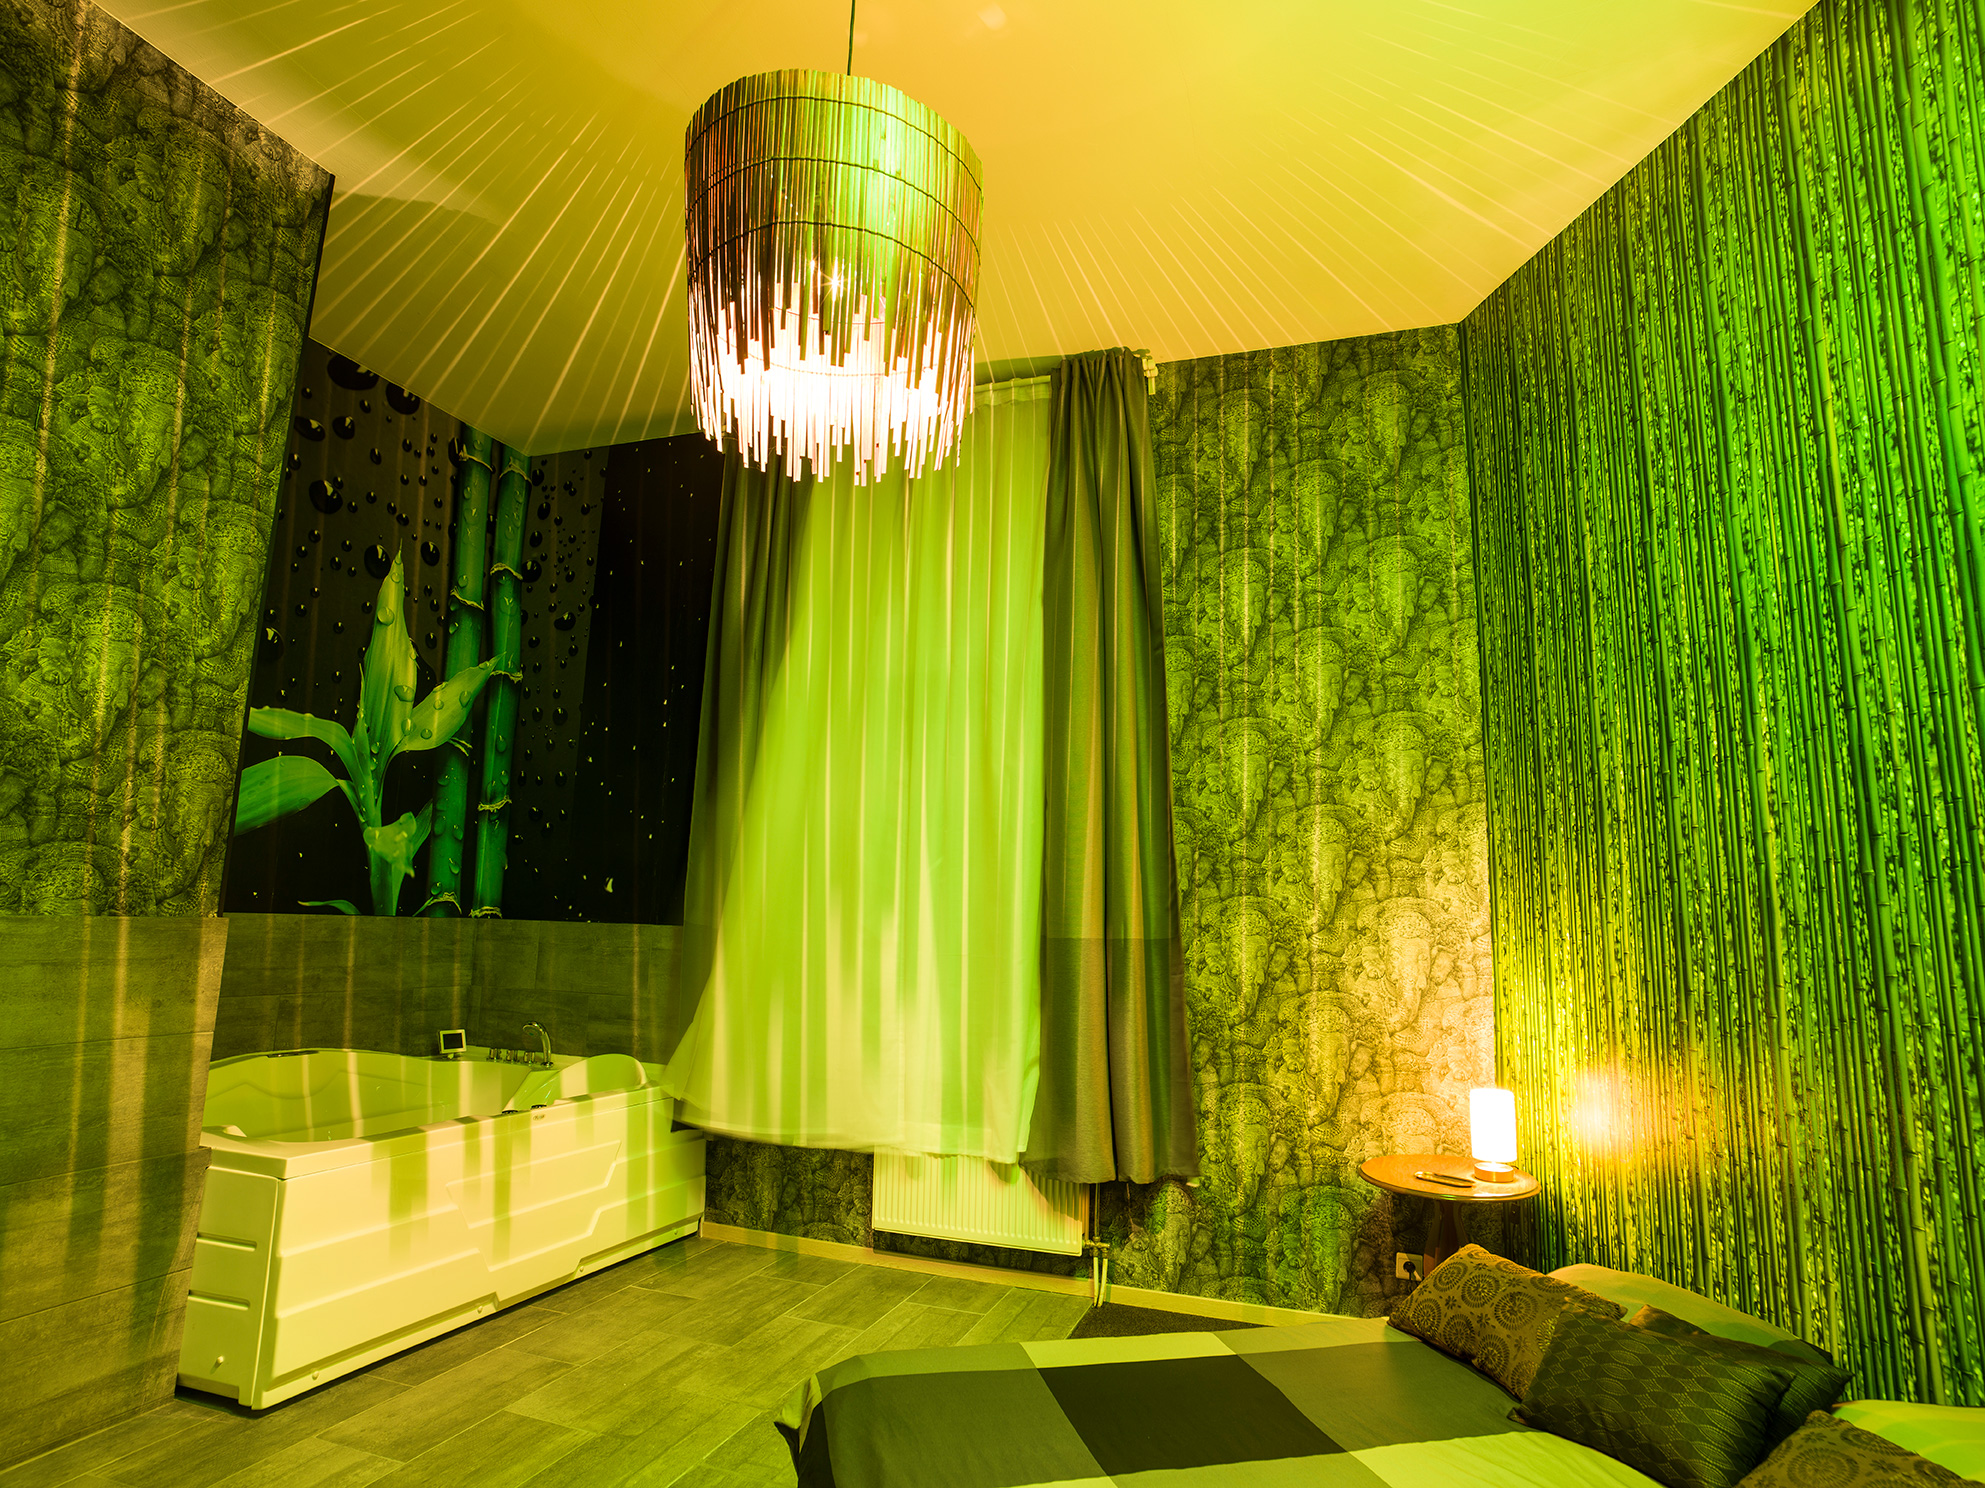 Green Room (Jacuzzi)